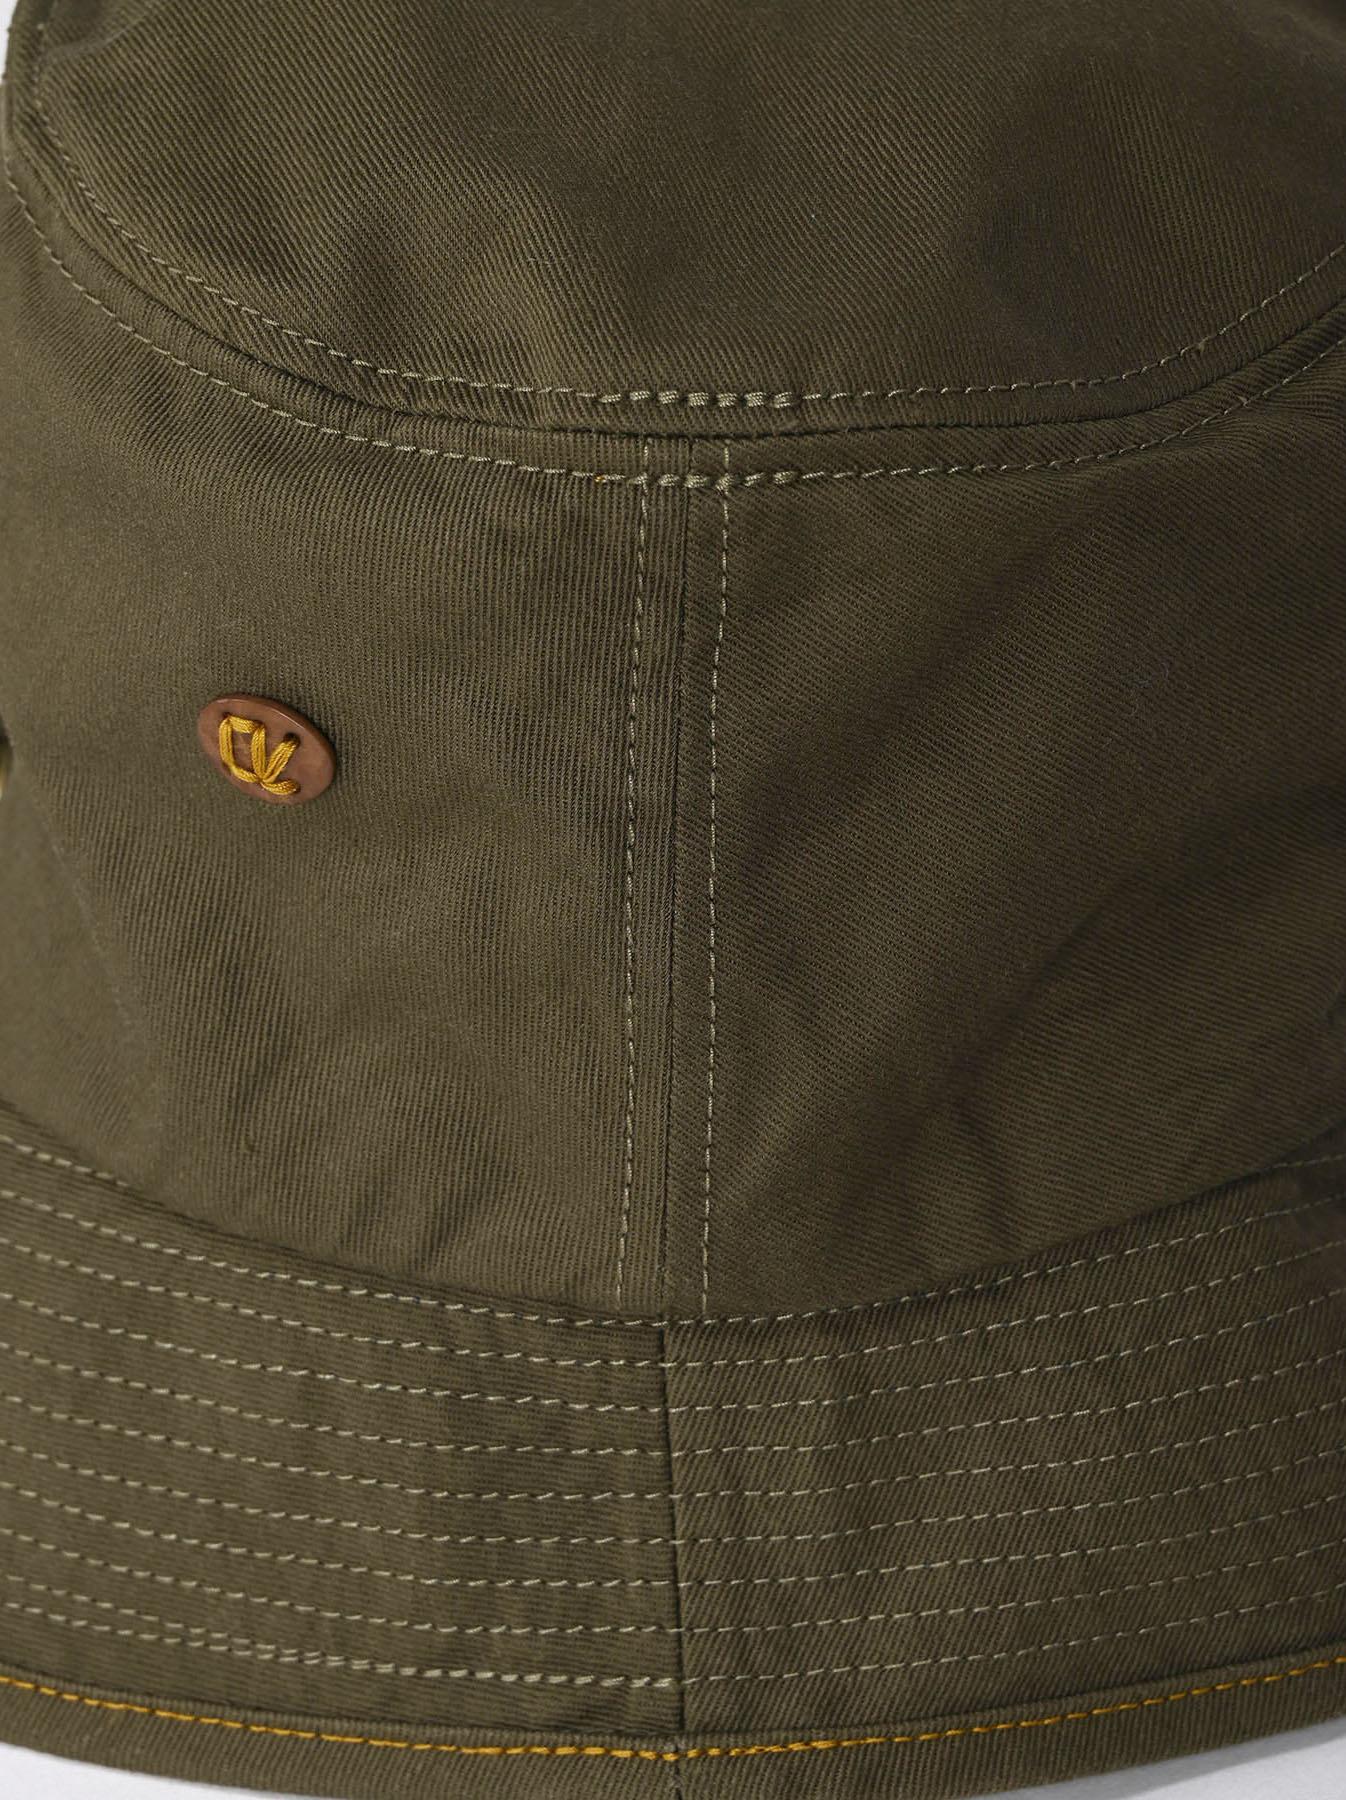 Okome Chino Sail Hat (0521)-8